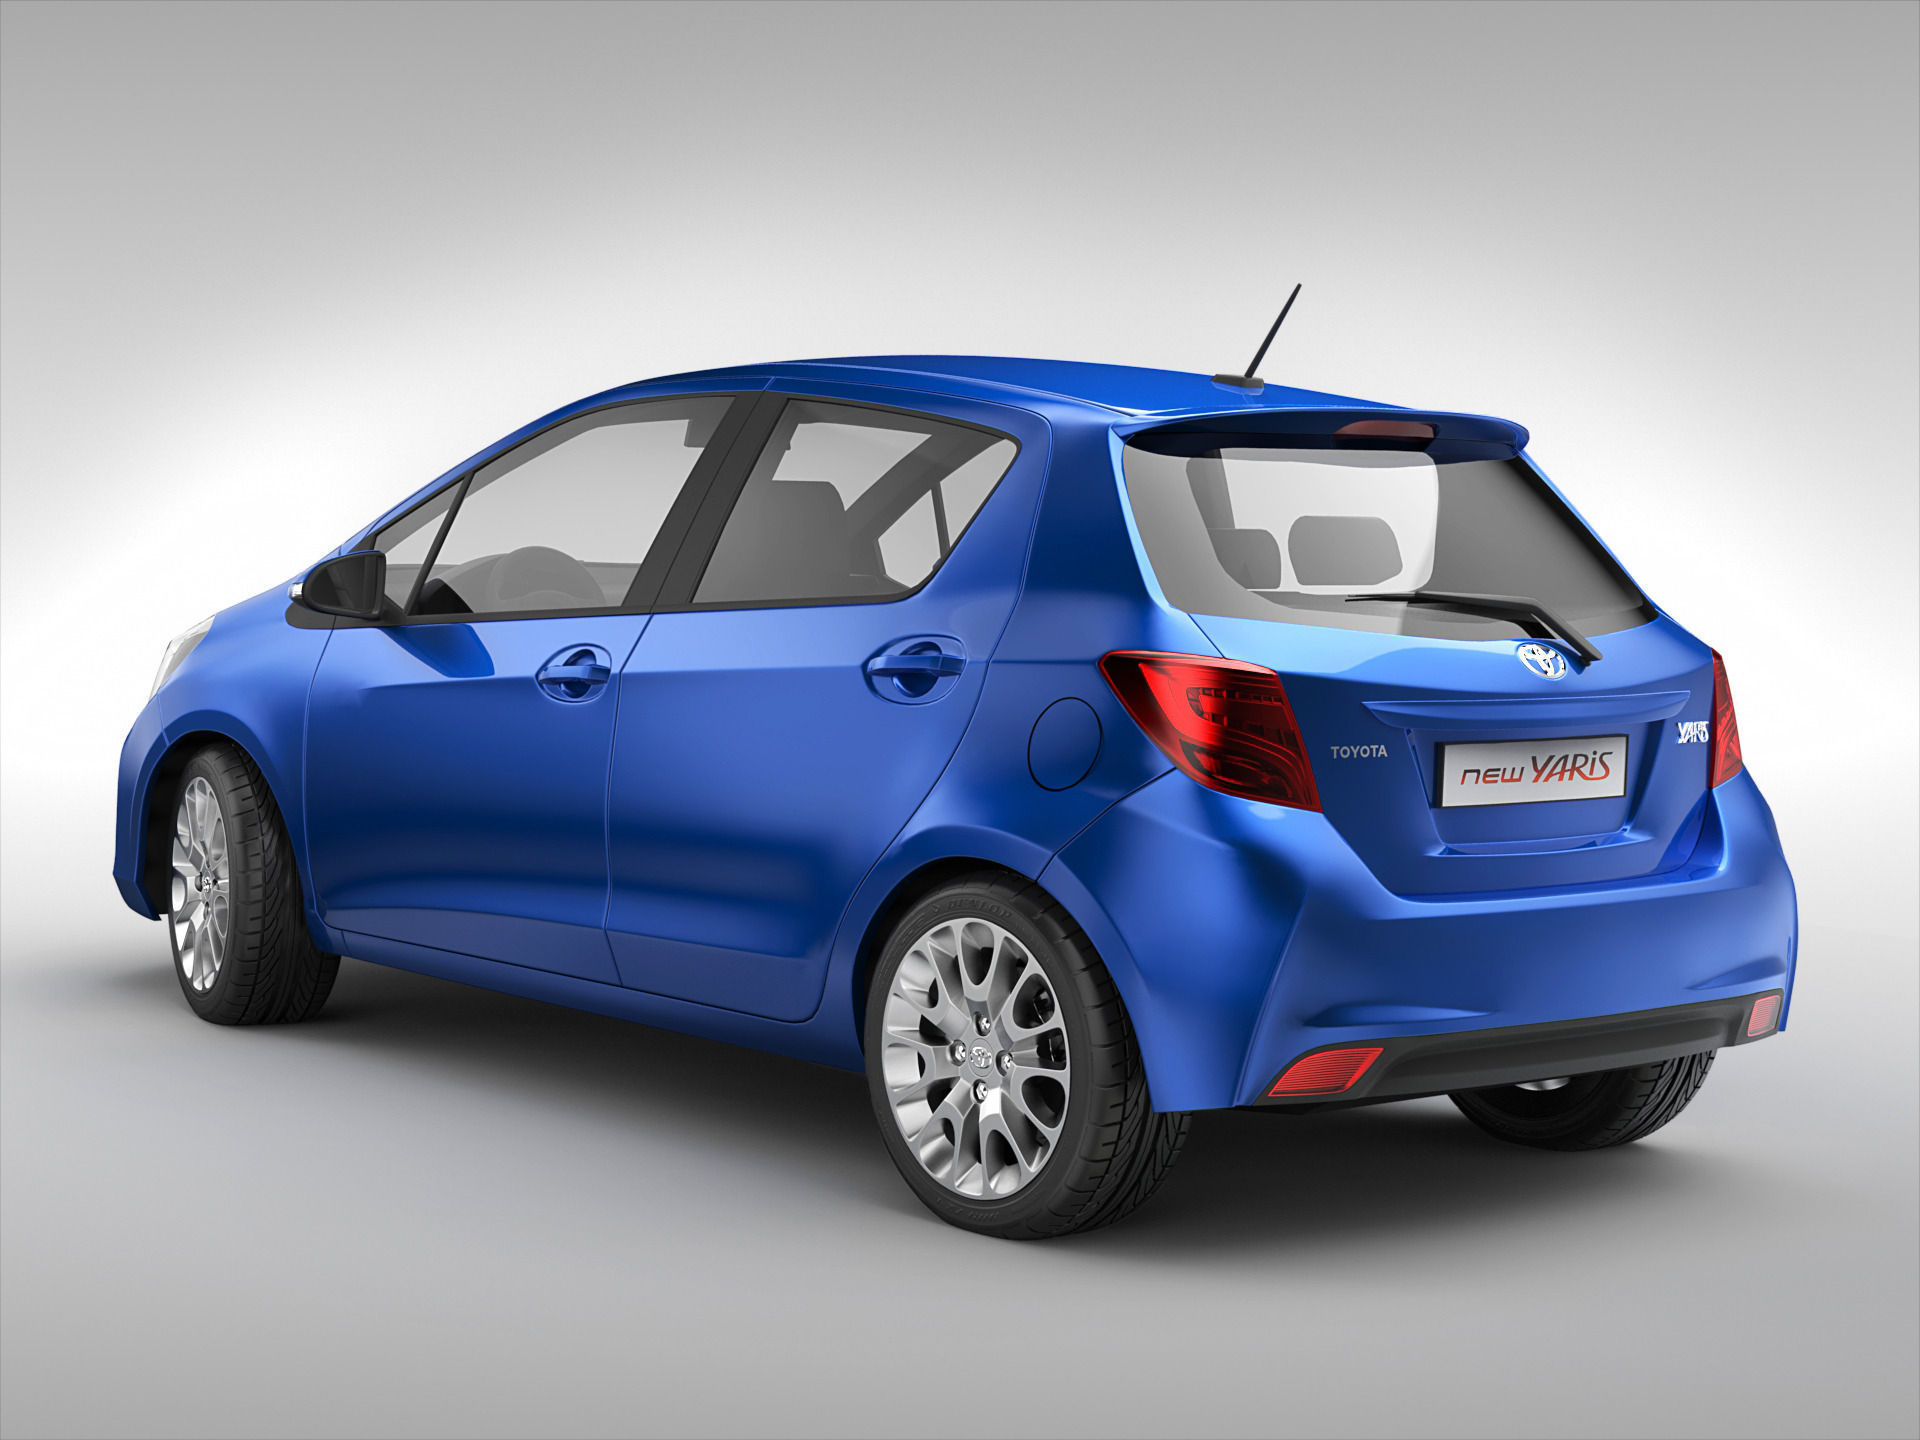 toyota yaris trd 2015 bekas grand new avanza veloz 2018 3d model max obj 3ds fbx c4d ma mb